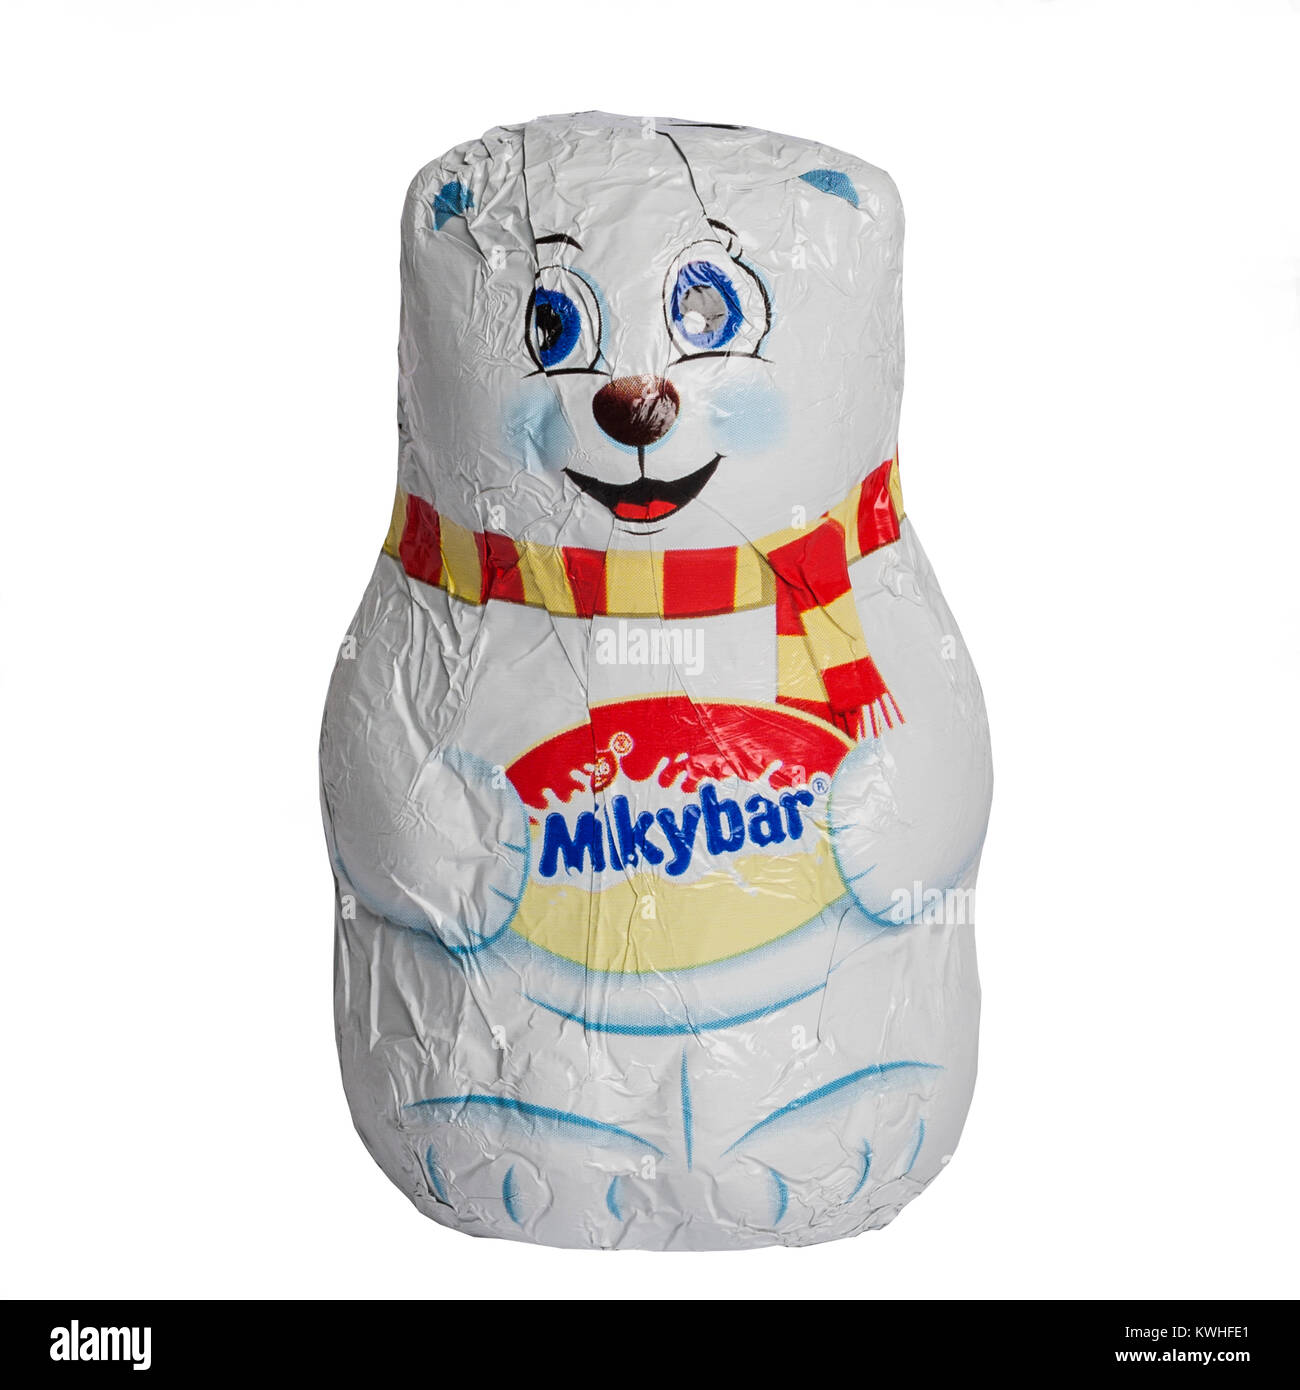 A festive Milky bar white chocolate polar bear on a white background - Stock Image